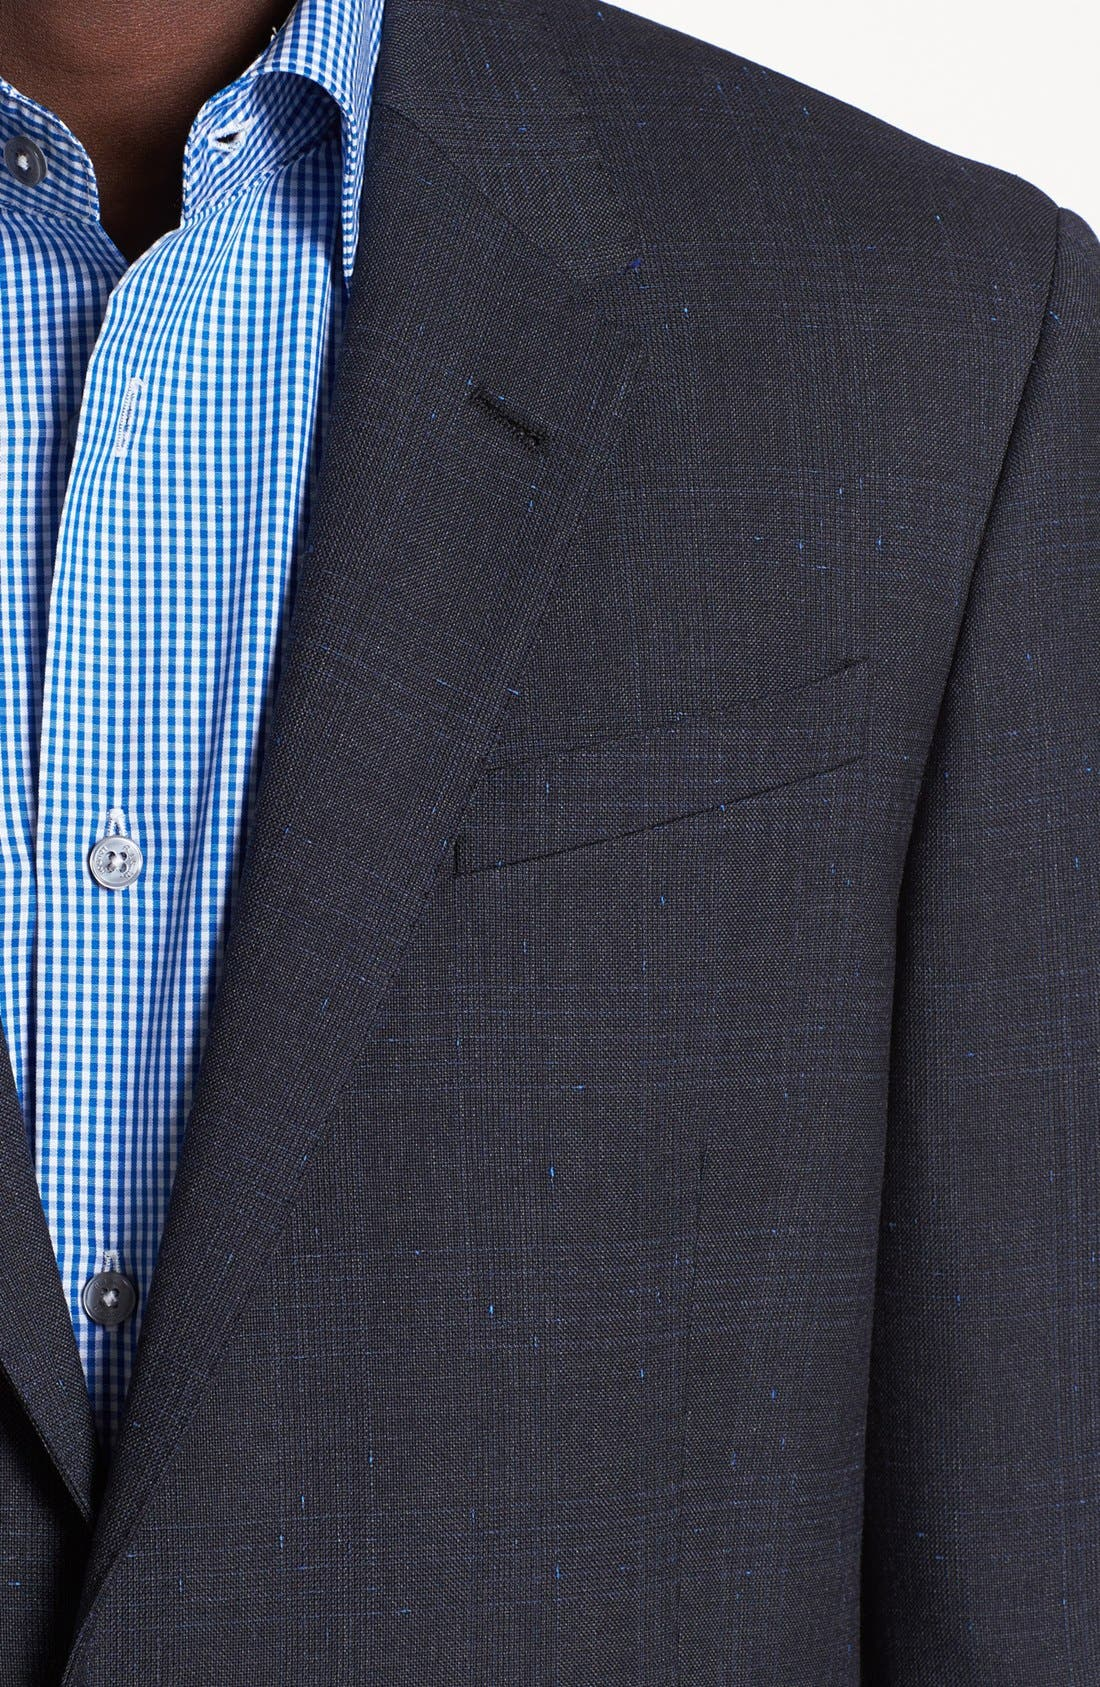 Alternate Image 2  - Paul Smith London Plaid Wool Suit